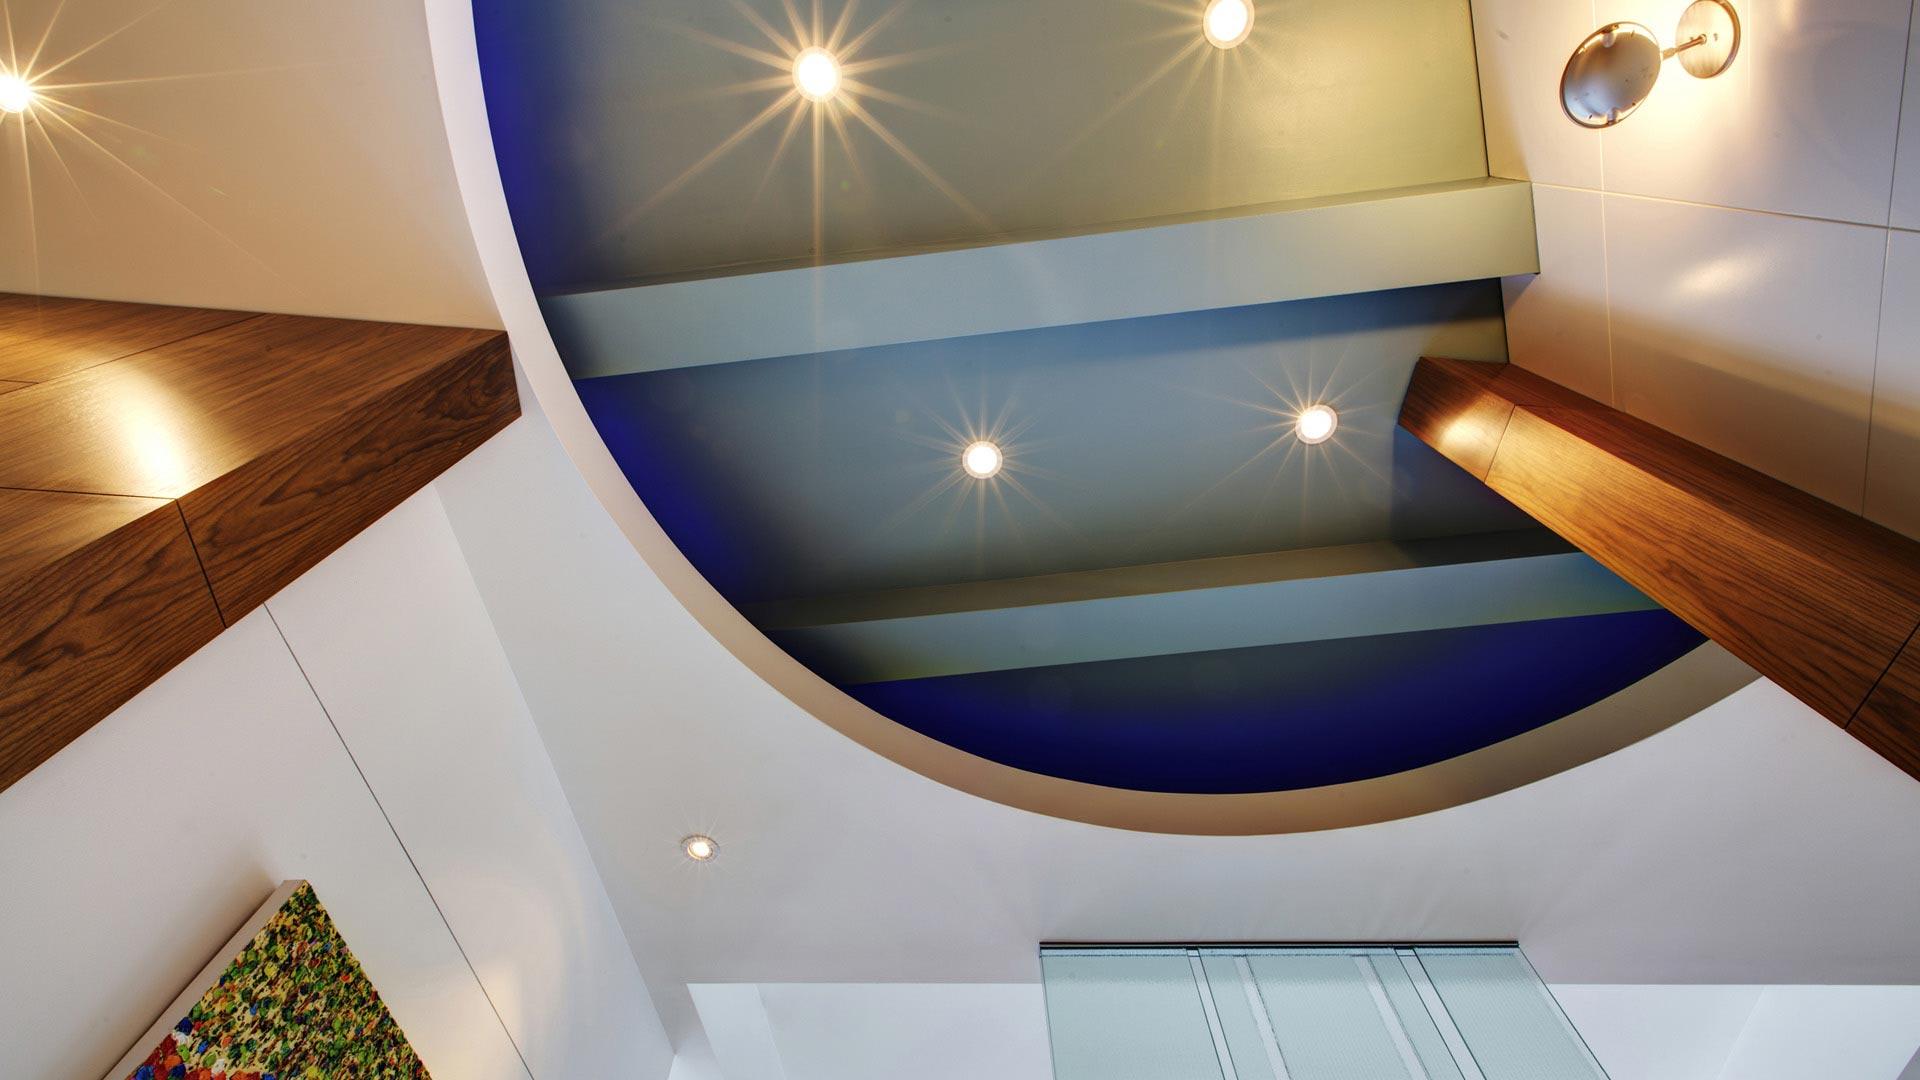 Urban Mid Rise Flat - Main Entrance - Foyers - HAUS Architecture, Christopher Short, Indianapolis Architect